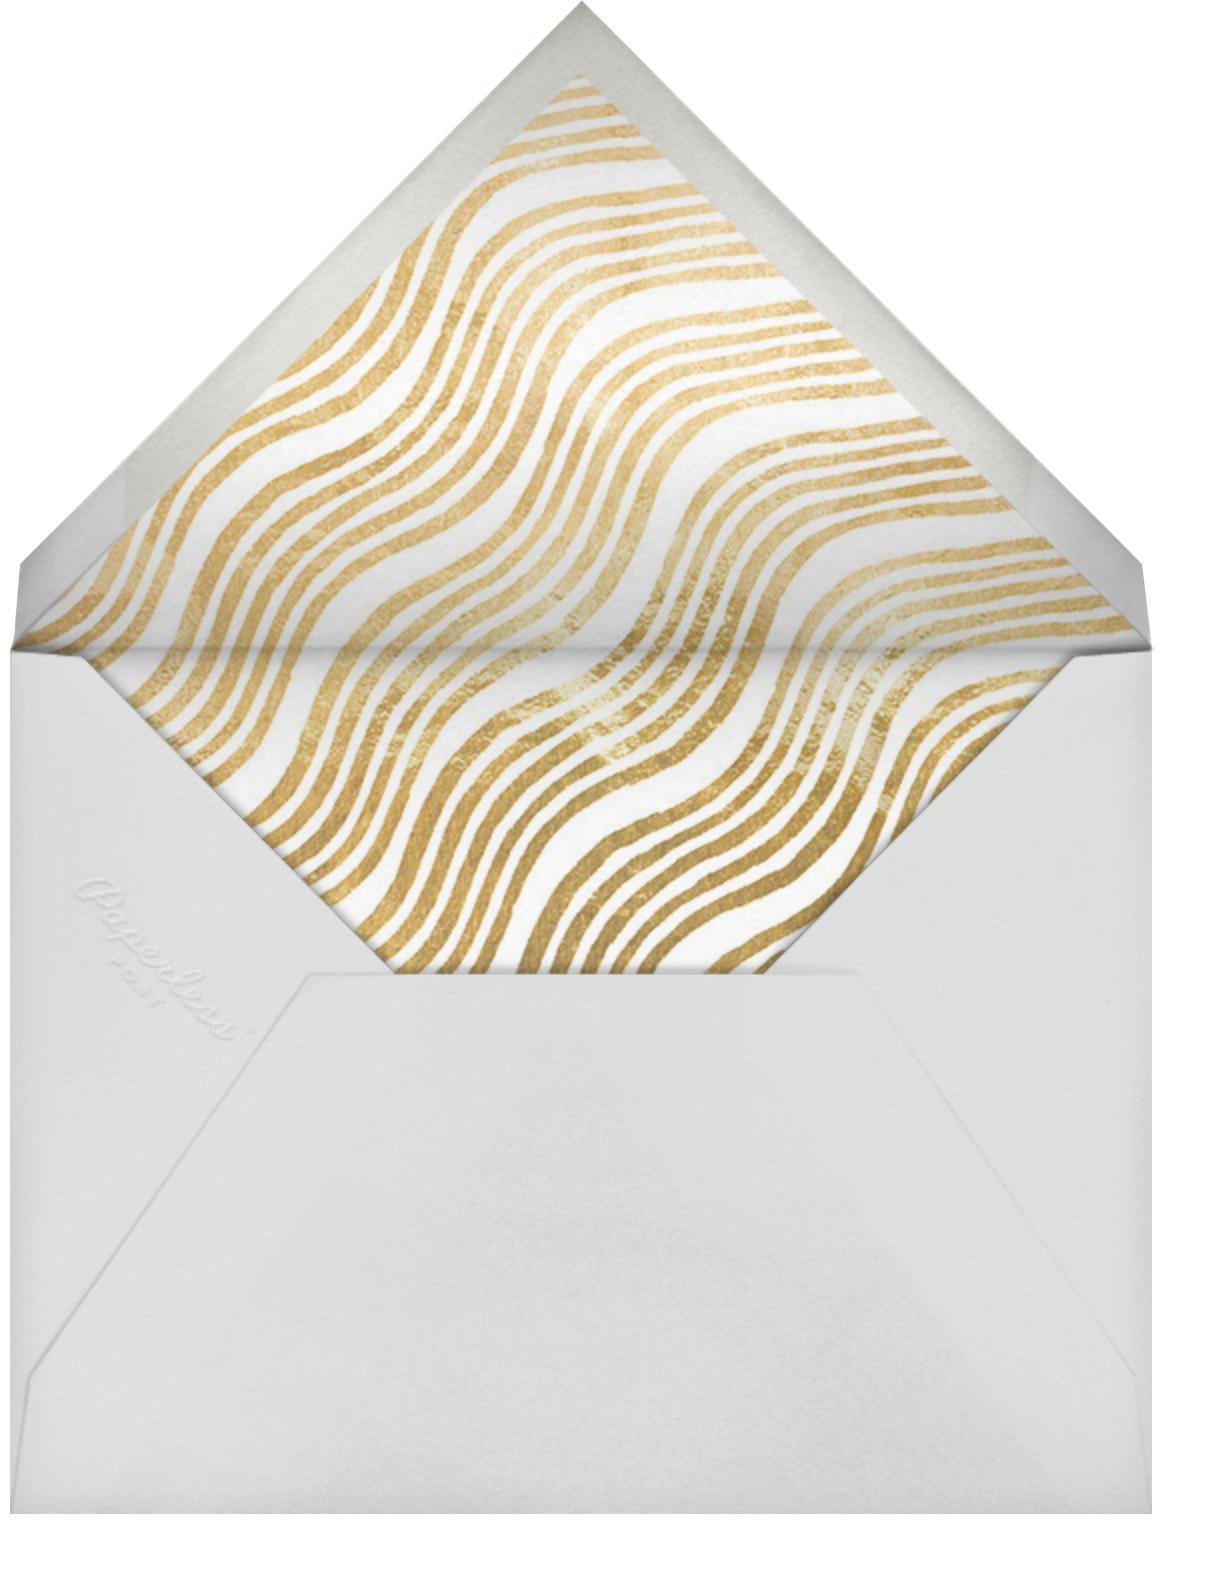 Ilona Stroke (Square) - Blue - Kelly Wearstler - Bat and bar mitzvah - envelope back